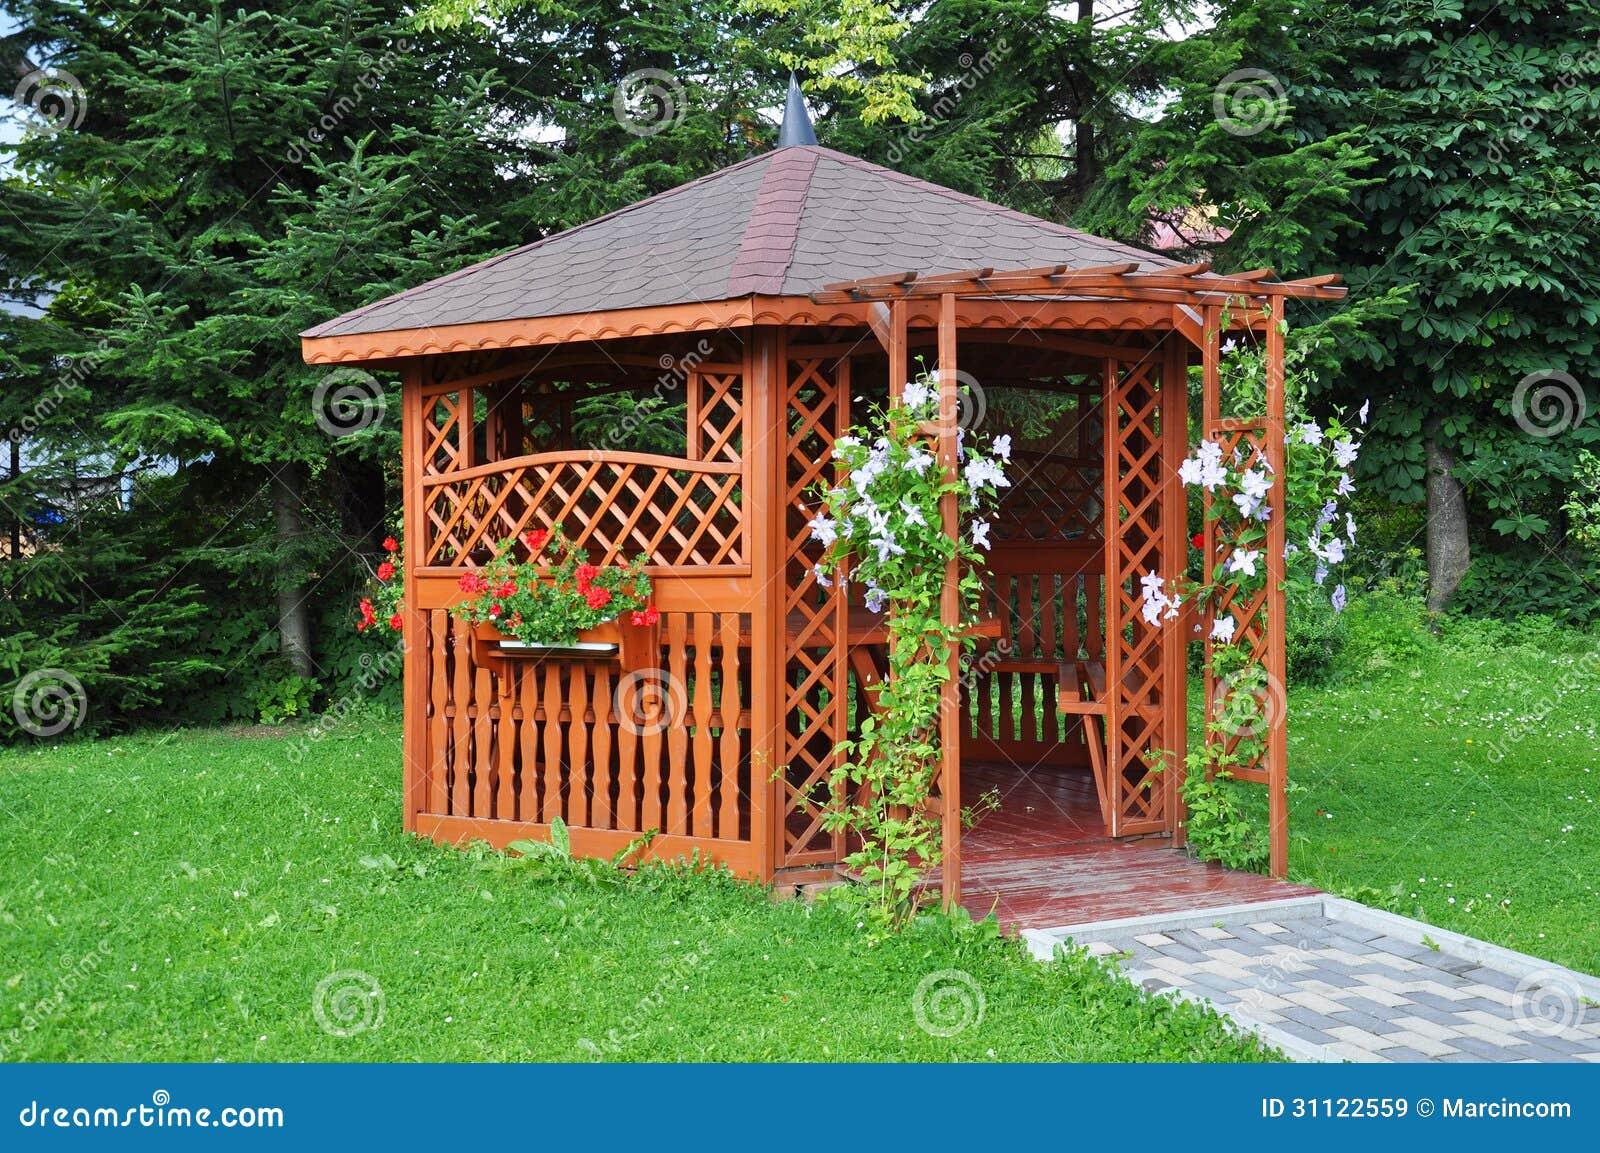 Gazebo In The Garden Wooden House Royalty Free Stock